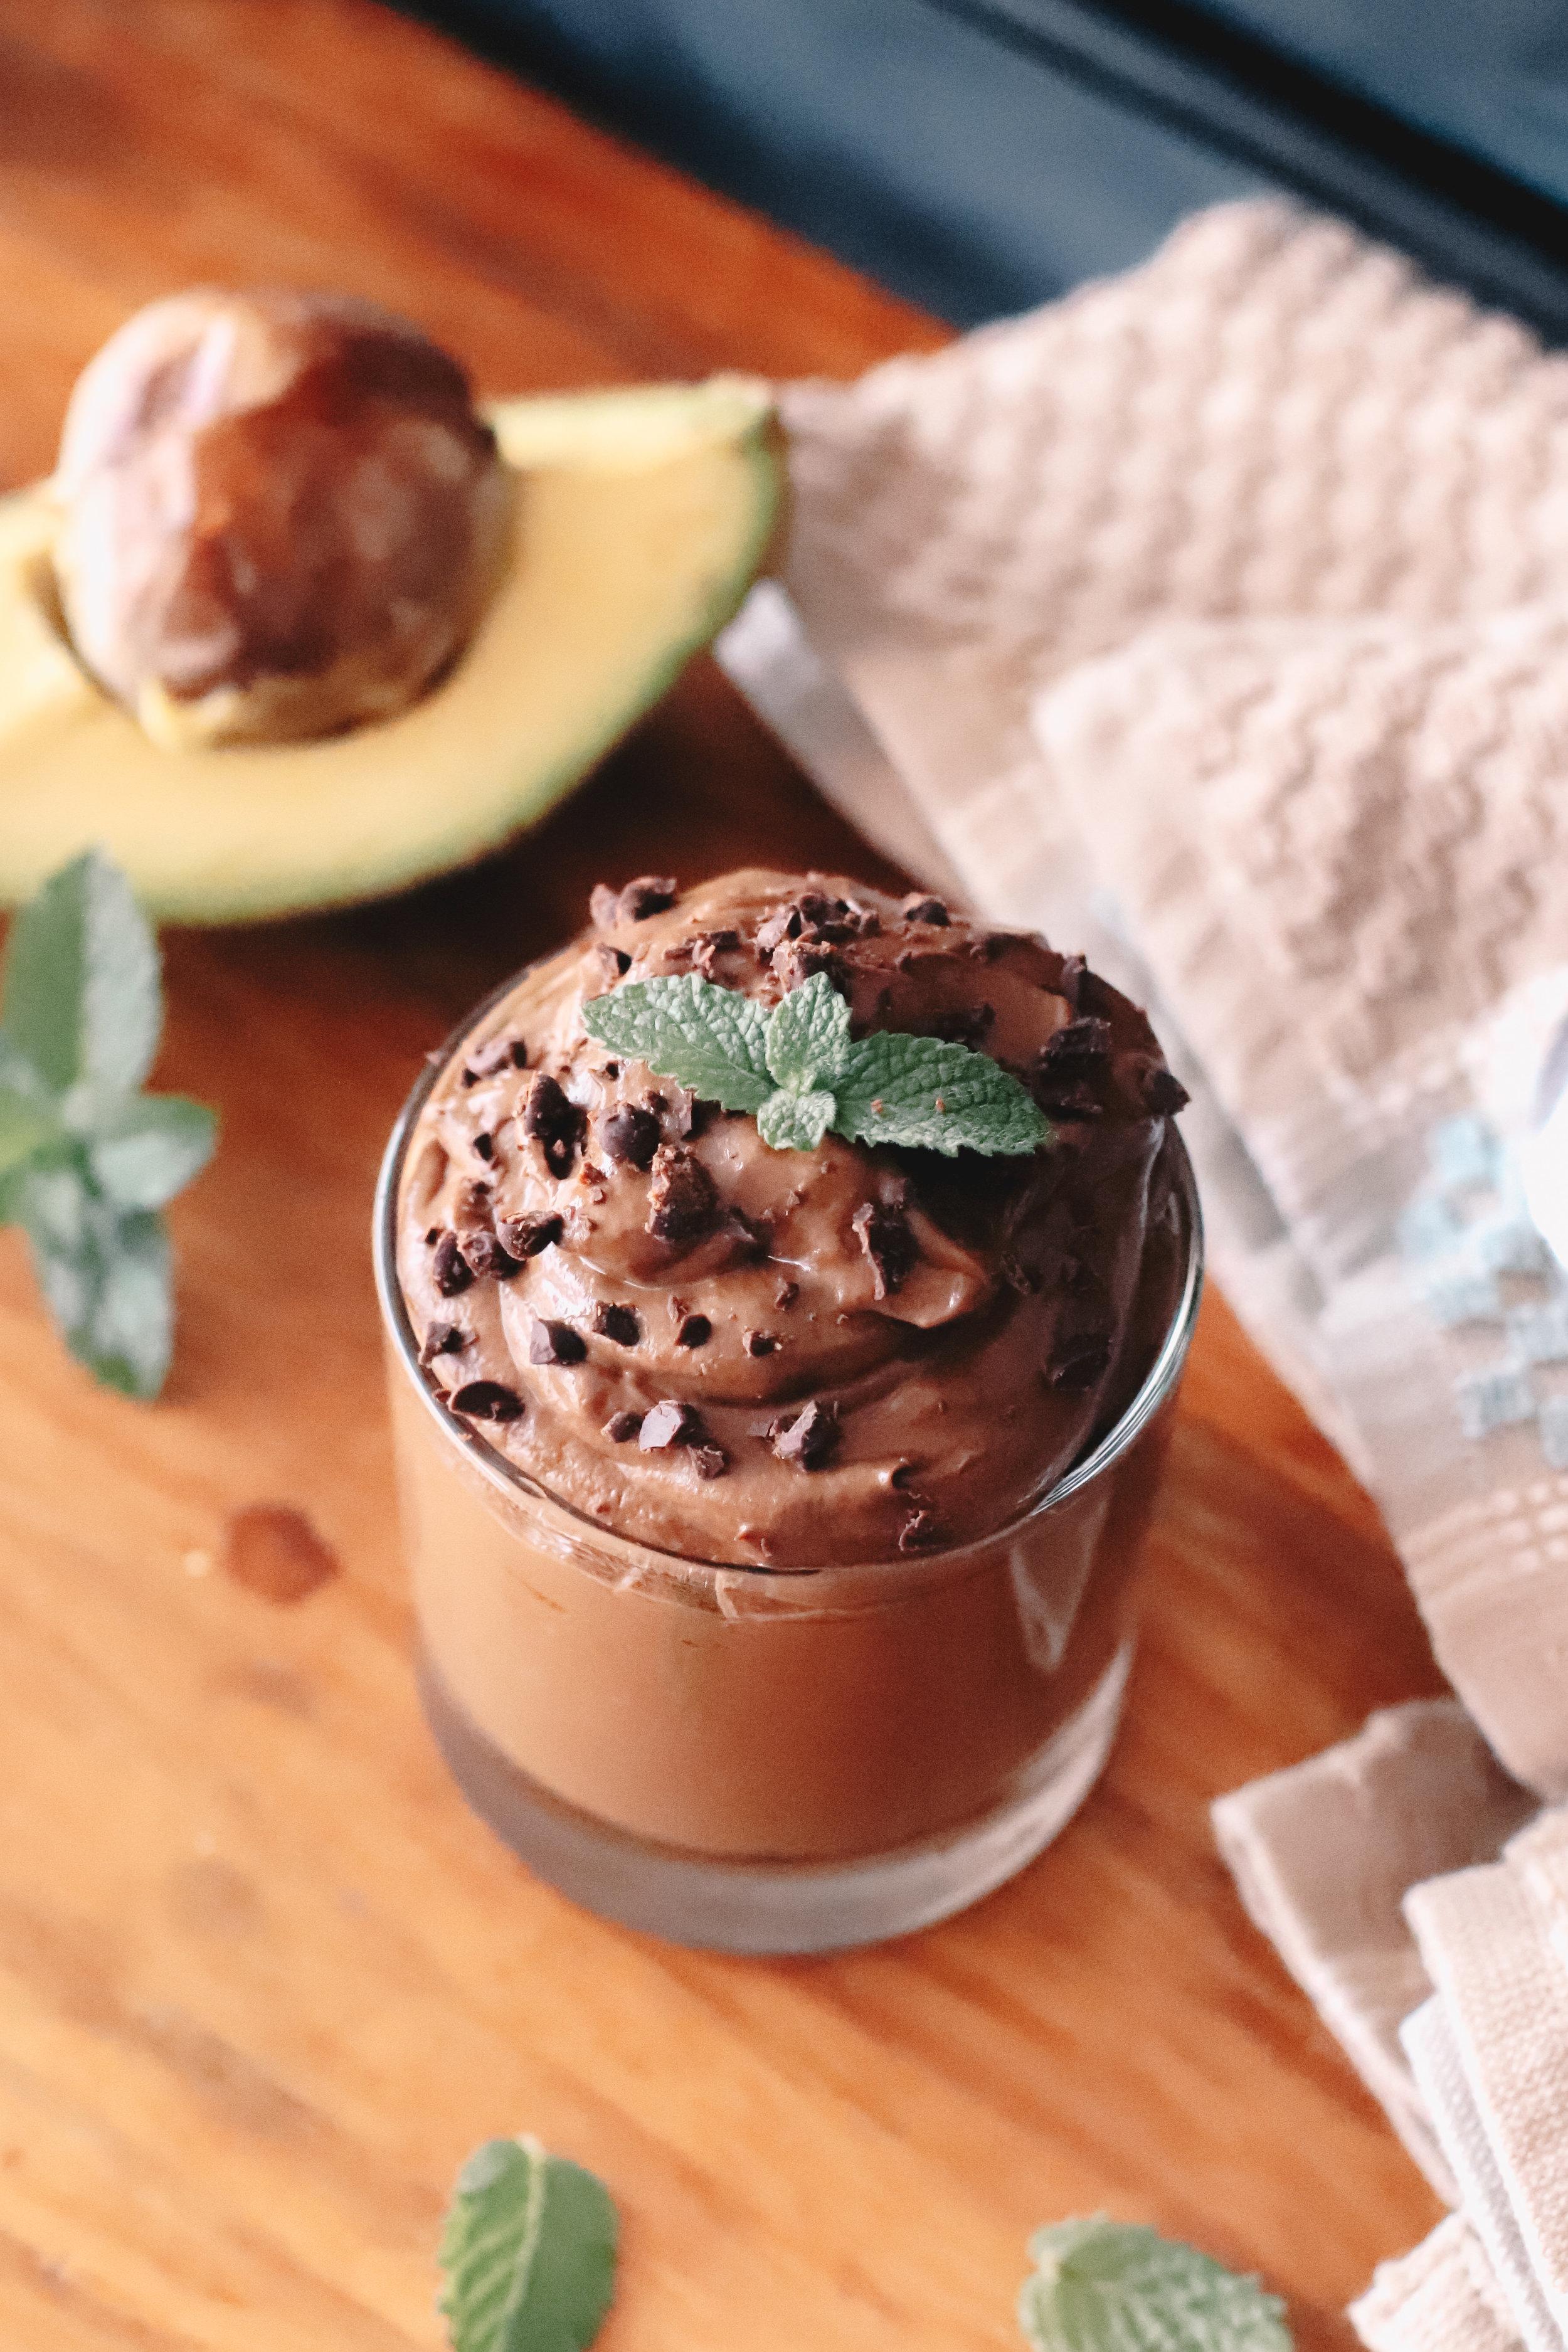 Mousse de chocolate sin lácteos - Por: Karla Alverio / Veggie JevaColaboración especial para Poliniza